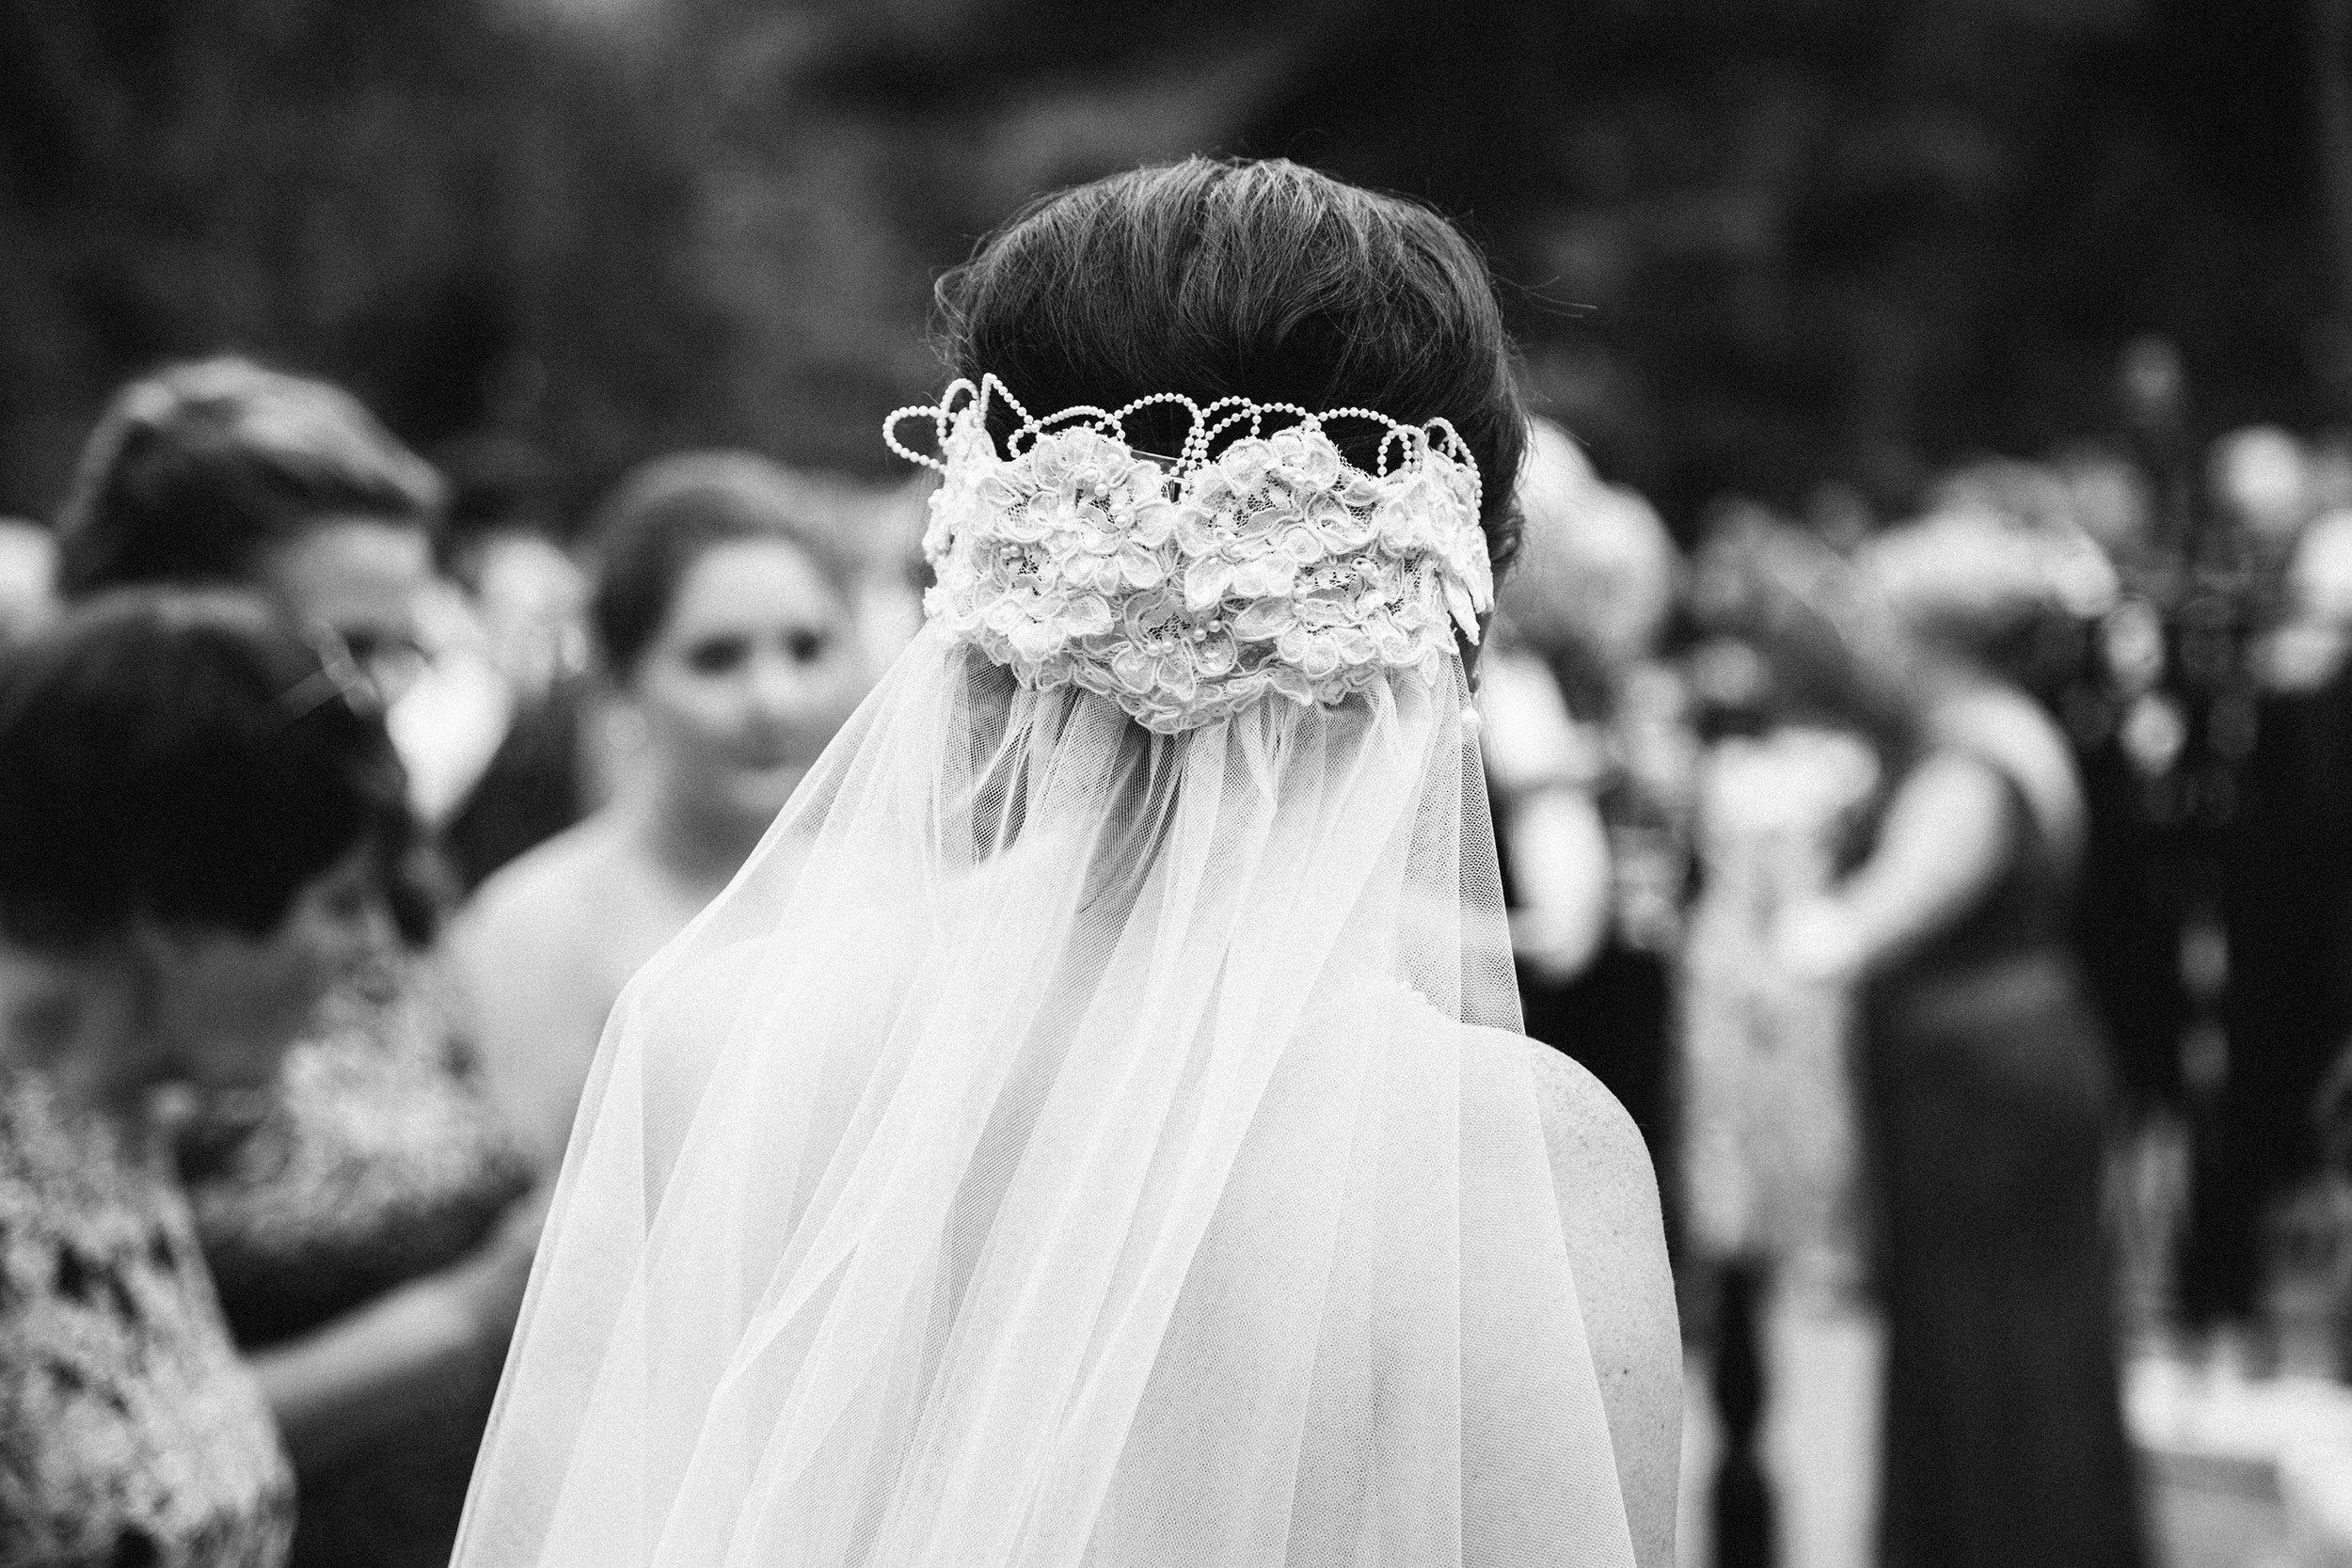 Evergreen-Museum-Balitmore-Maryland-Wedding-Black-Tie-Bride-041.jpg